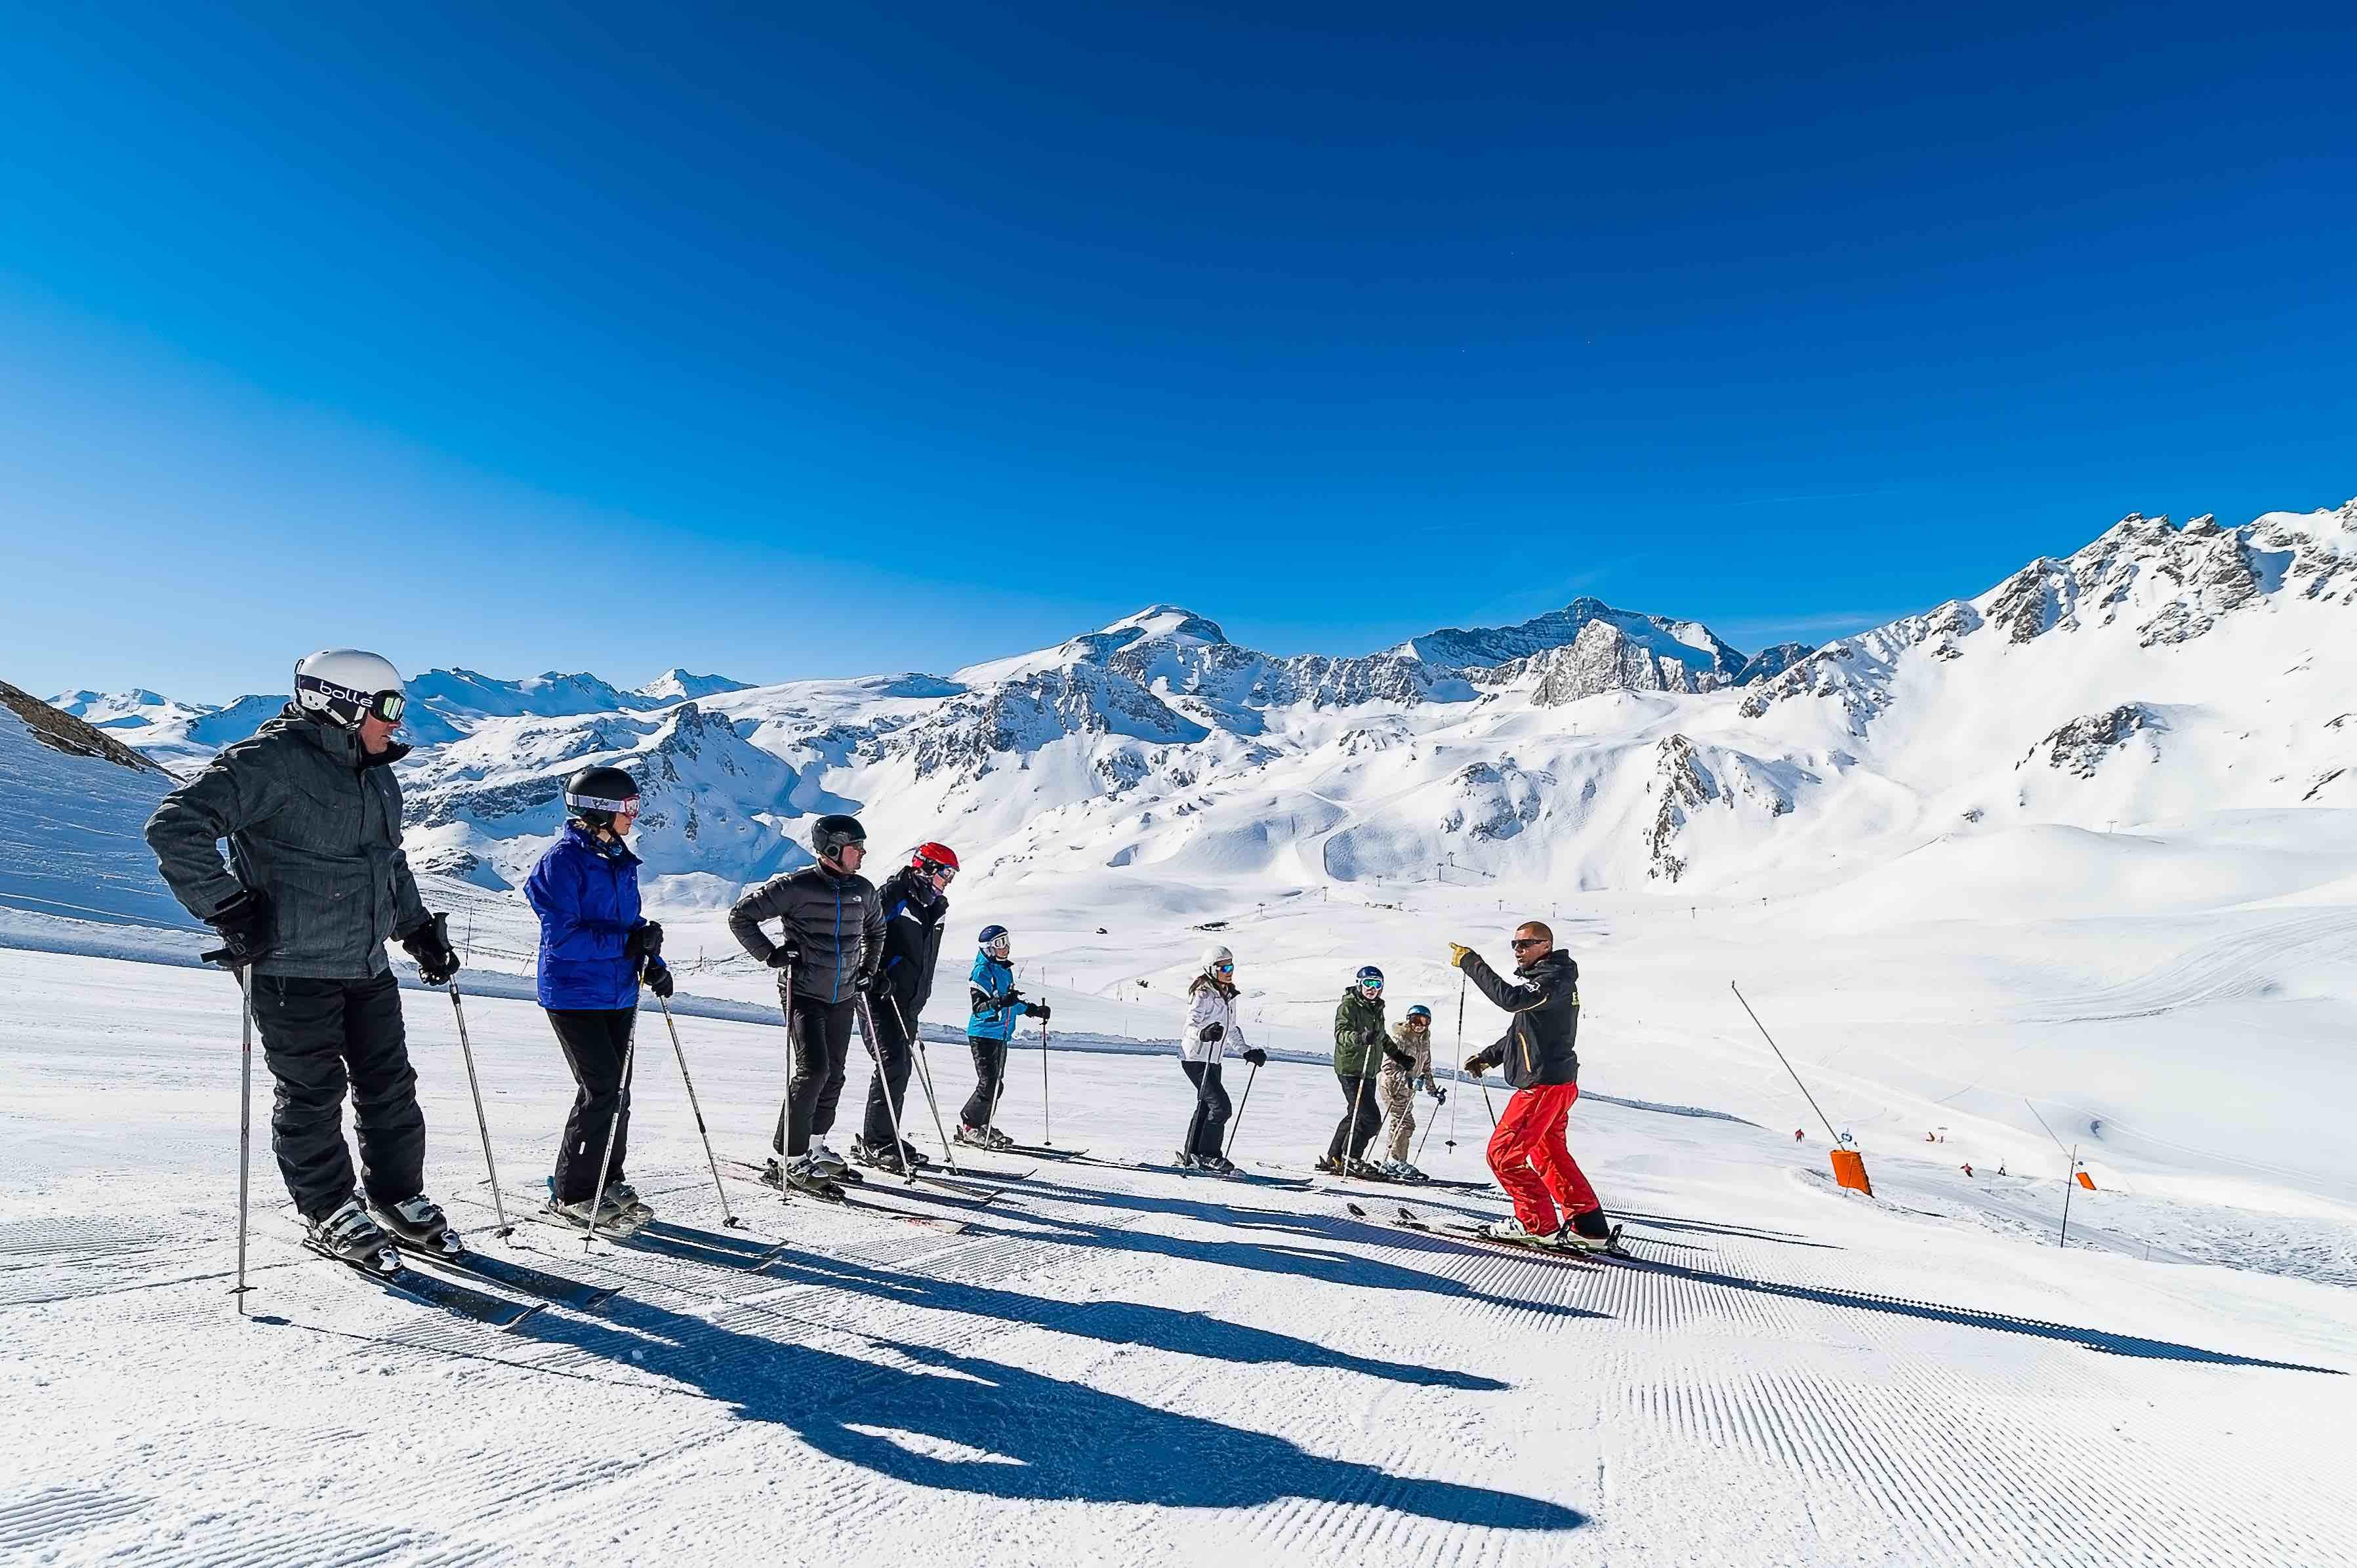 Clases de esquí para adultos a partir de 14 años para principiantes